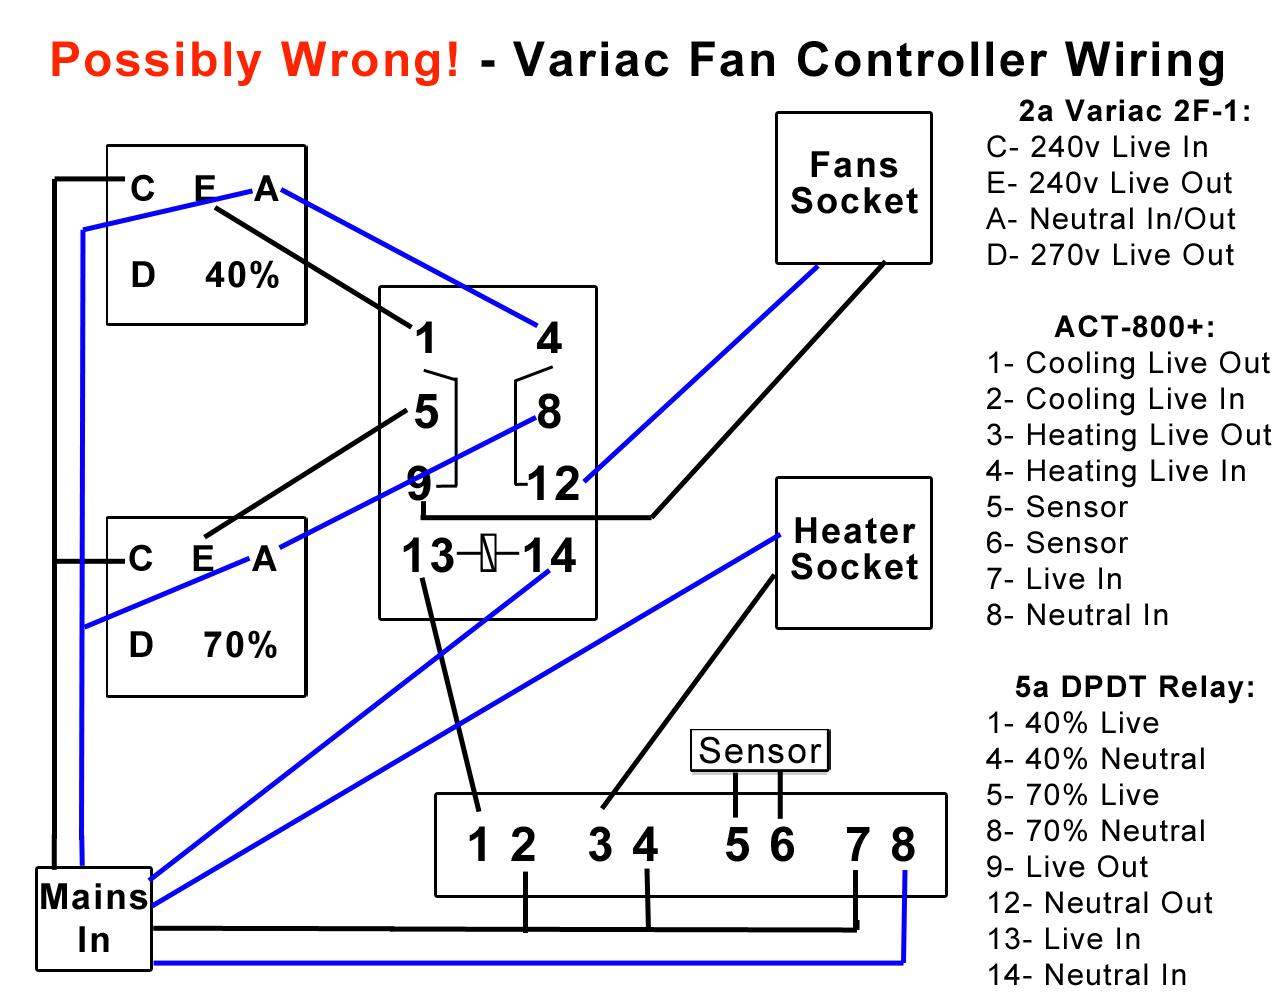 variac wiring diagram for car audio equalizer a 460 volt motor diagrams massey